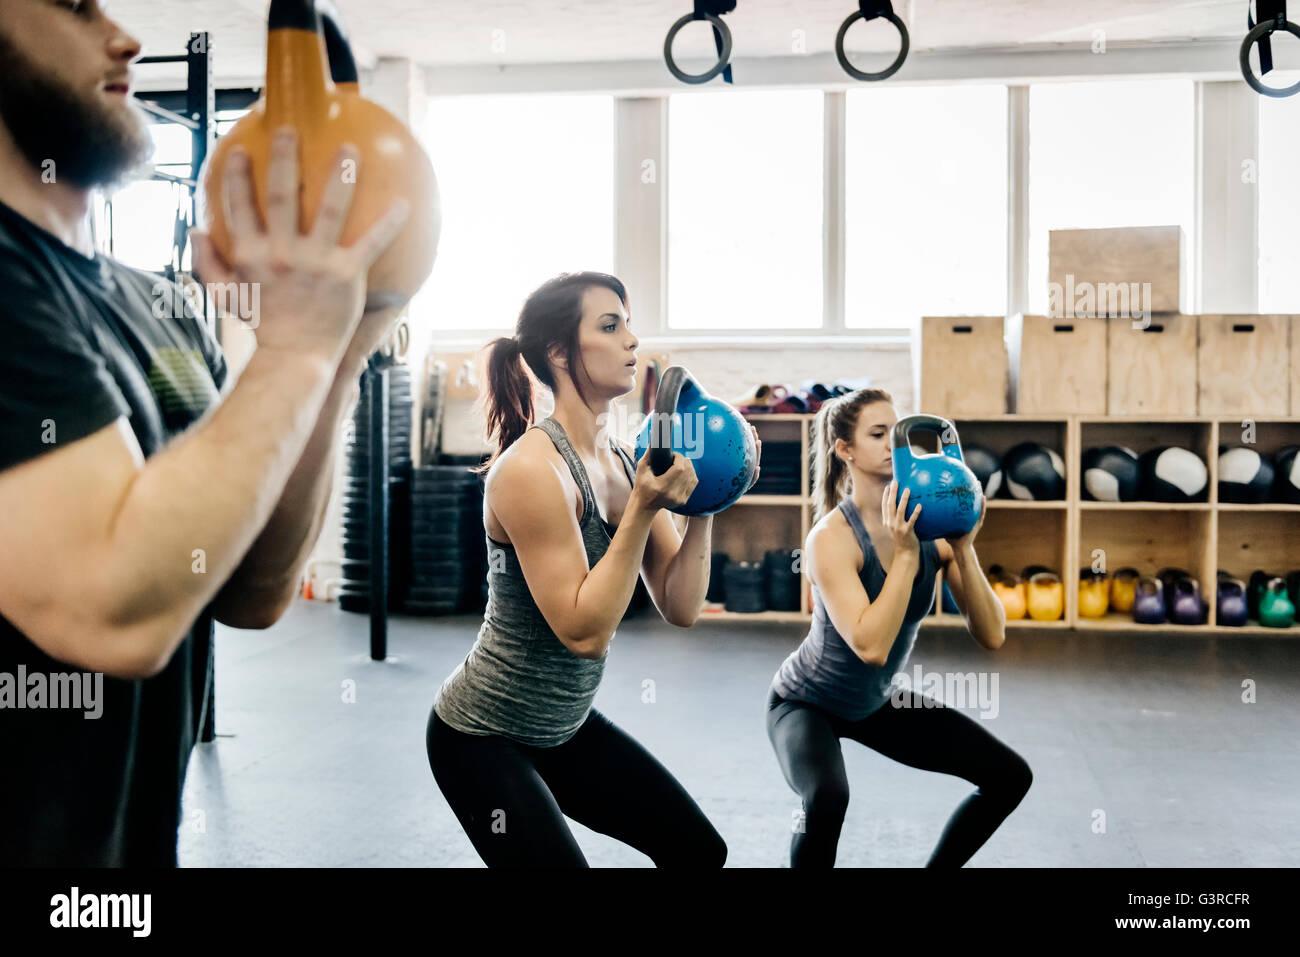 L'Allemagne, les jeunes femmes et l'homme l'entraînement avec kettlebells in gym Banque D'Images